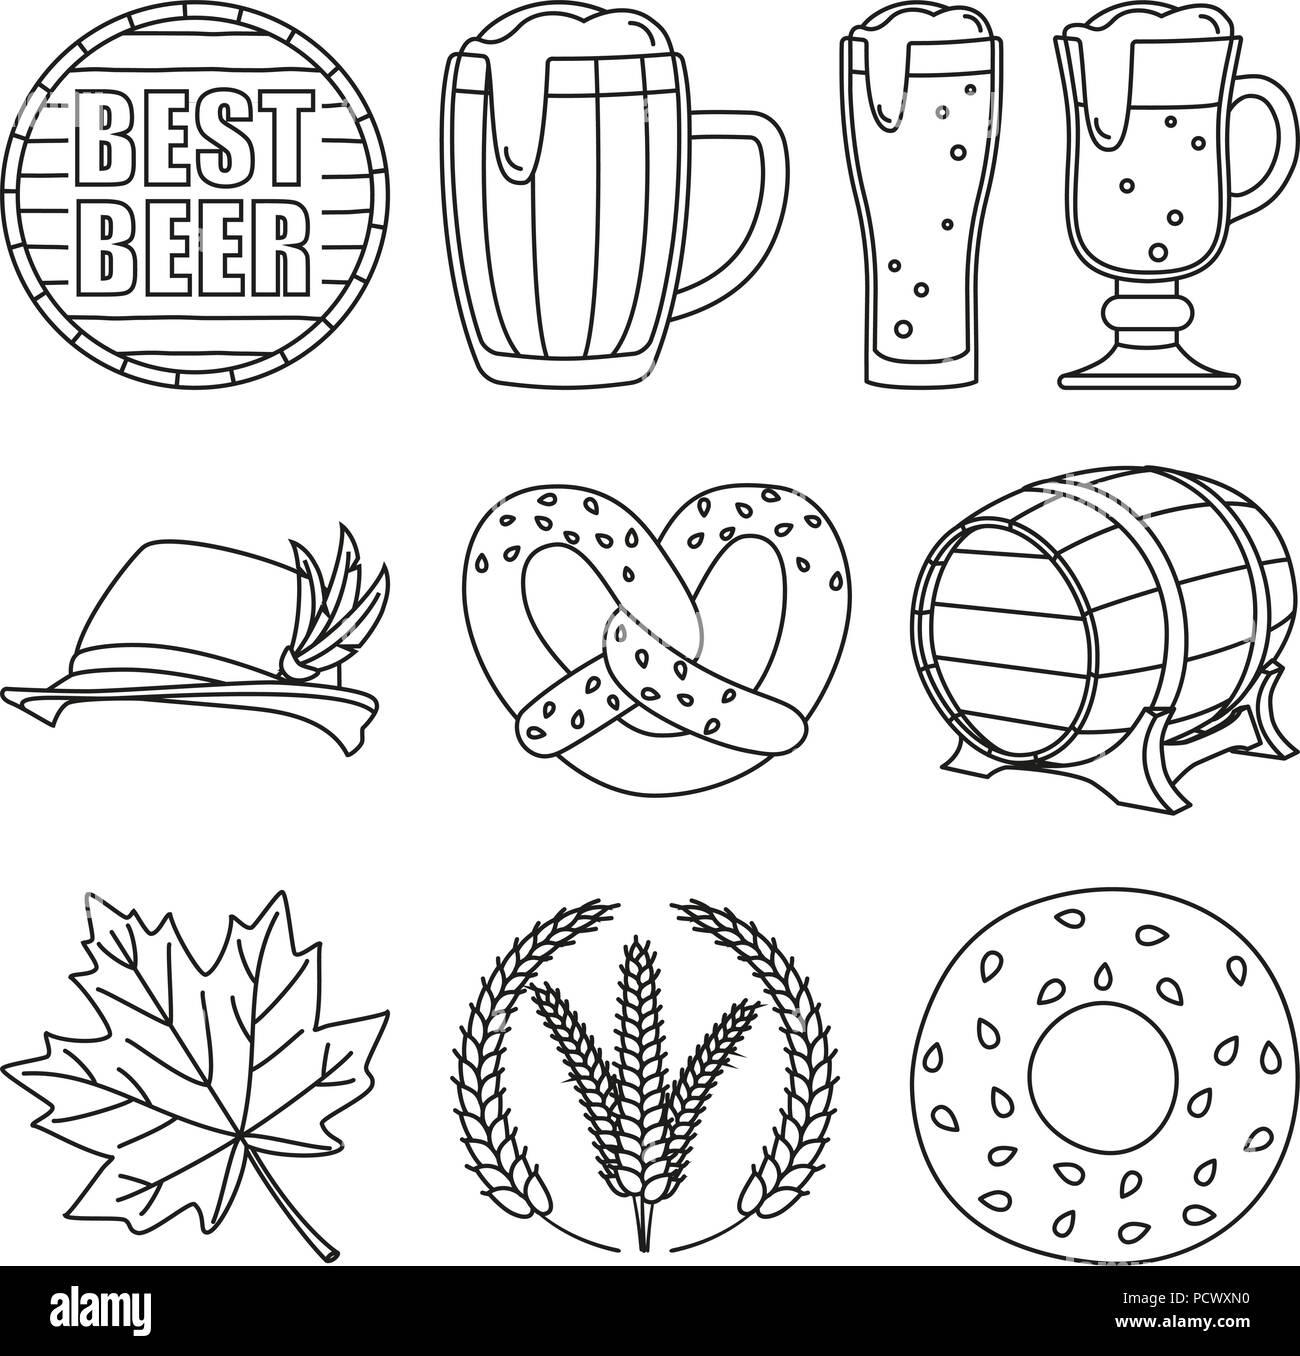 Line art black and white 10 oktoberfest elements - Stock Vector